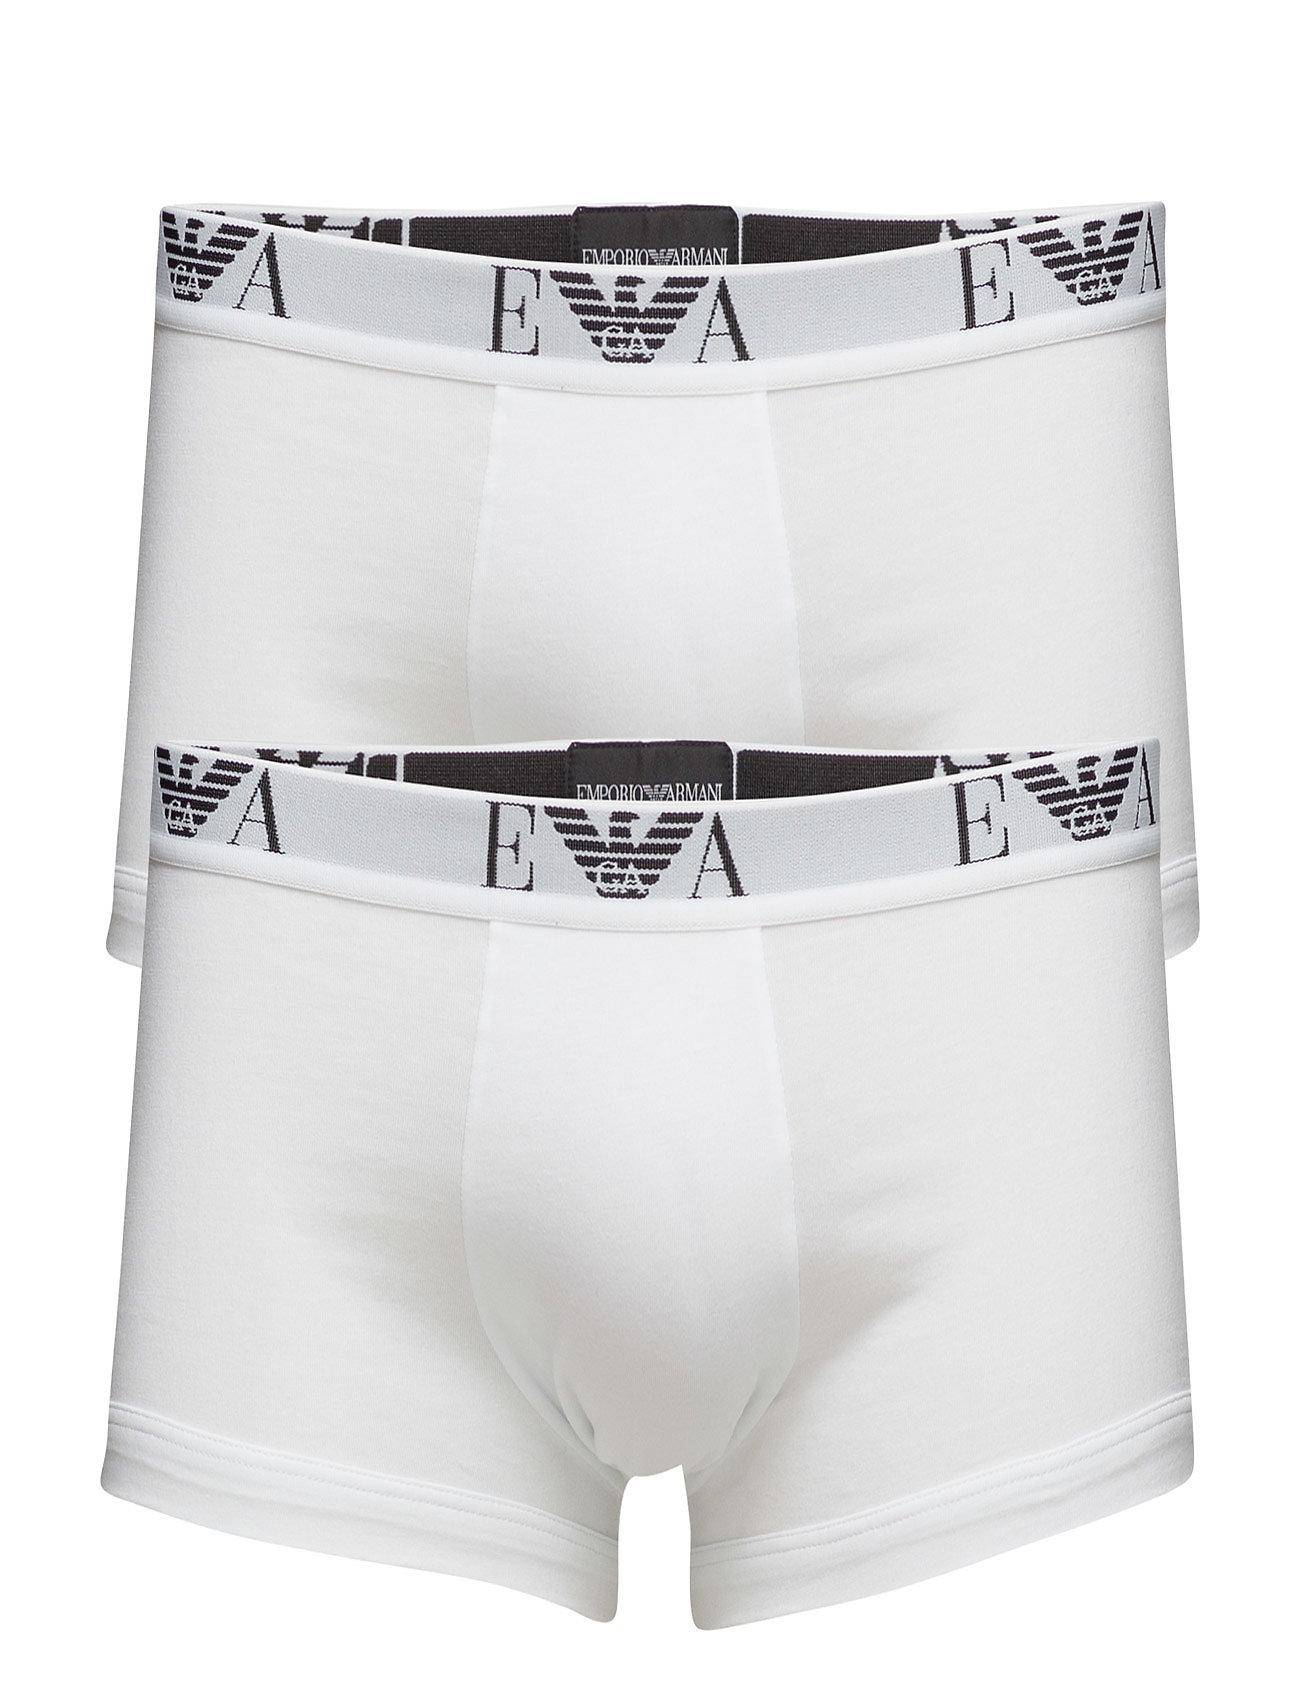 Image of Mens Knit 2pack Boxe Boxershorts Hvid Emporio Armani (2603354949)